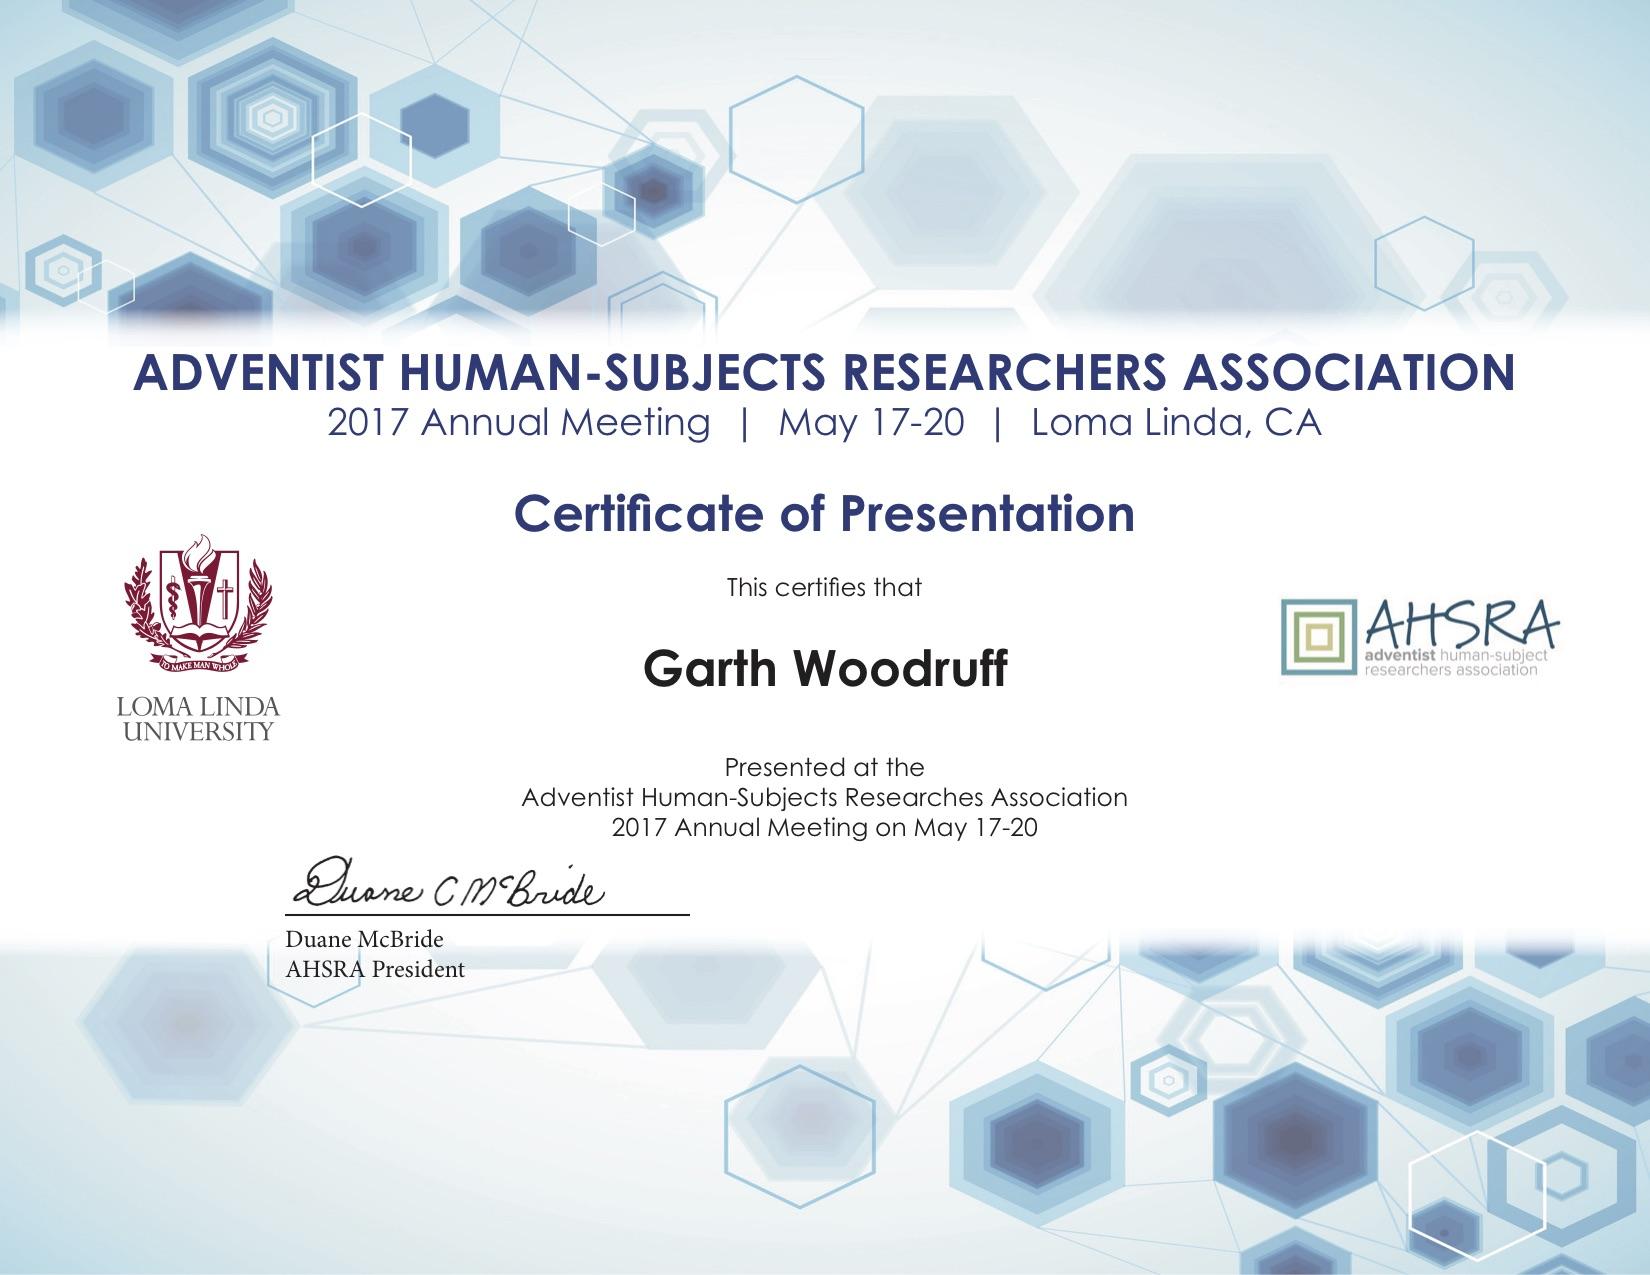 Presentation Certs Merge Complete_Woodruff.jpg